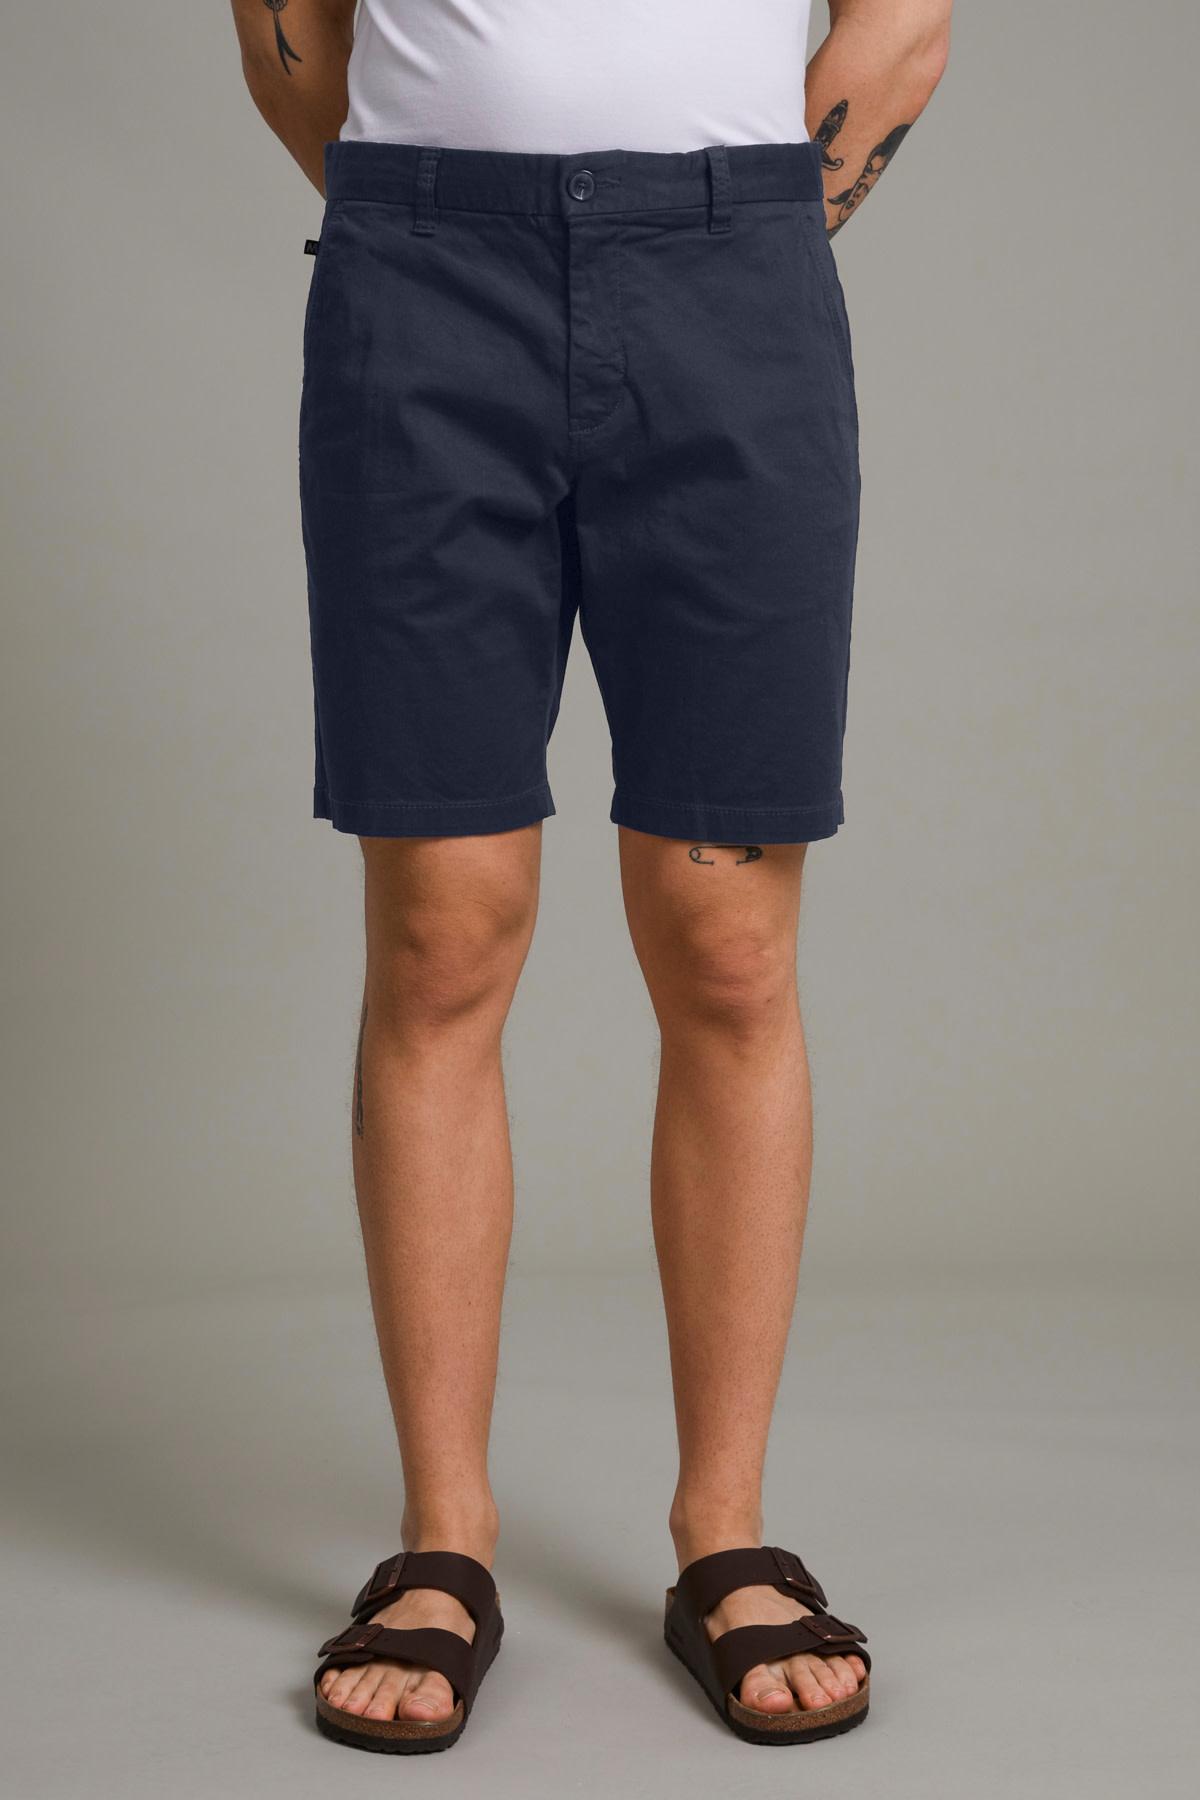 Pristu Chino Shorts - Dark Navy